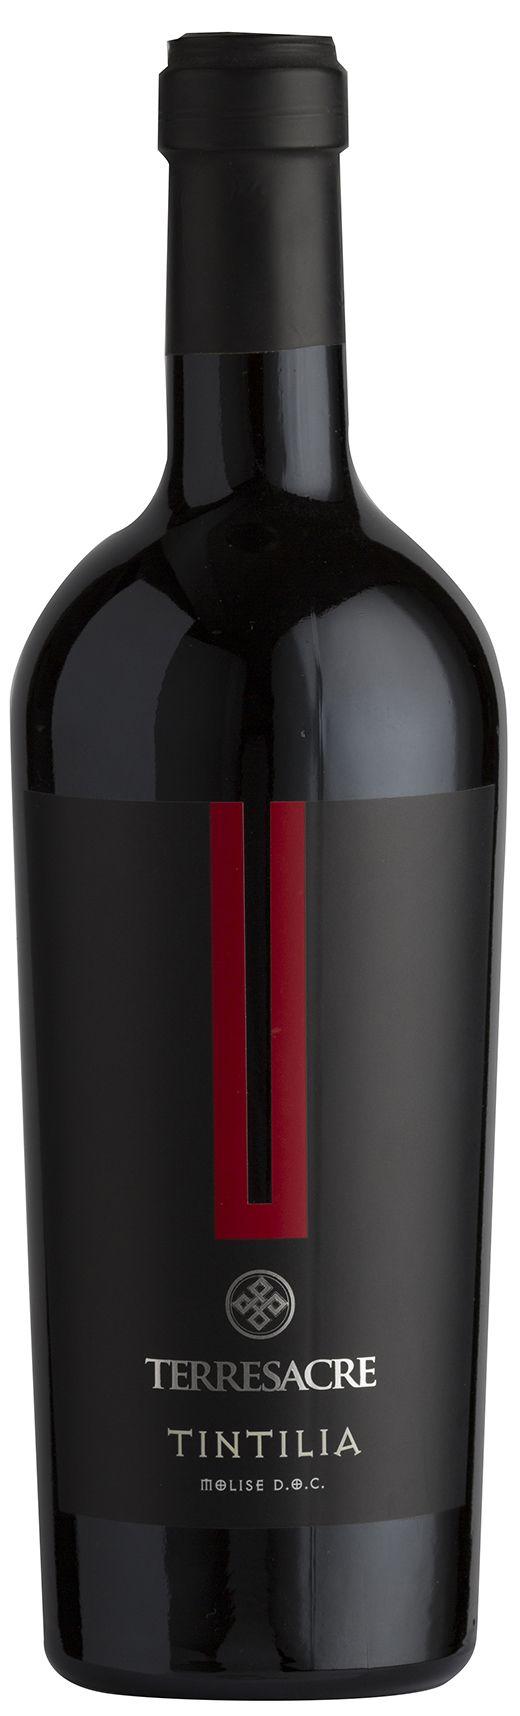 Tintilia - Terresacre #winelabel #winedesign #italianwine #Francescon #Collodi #francesconcollodi